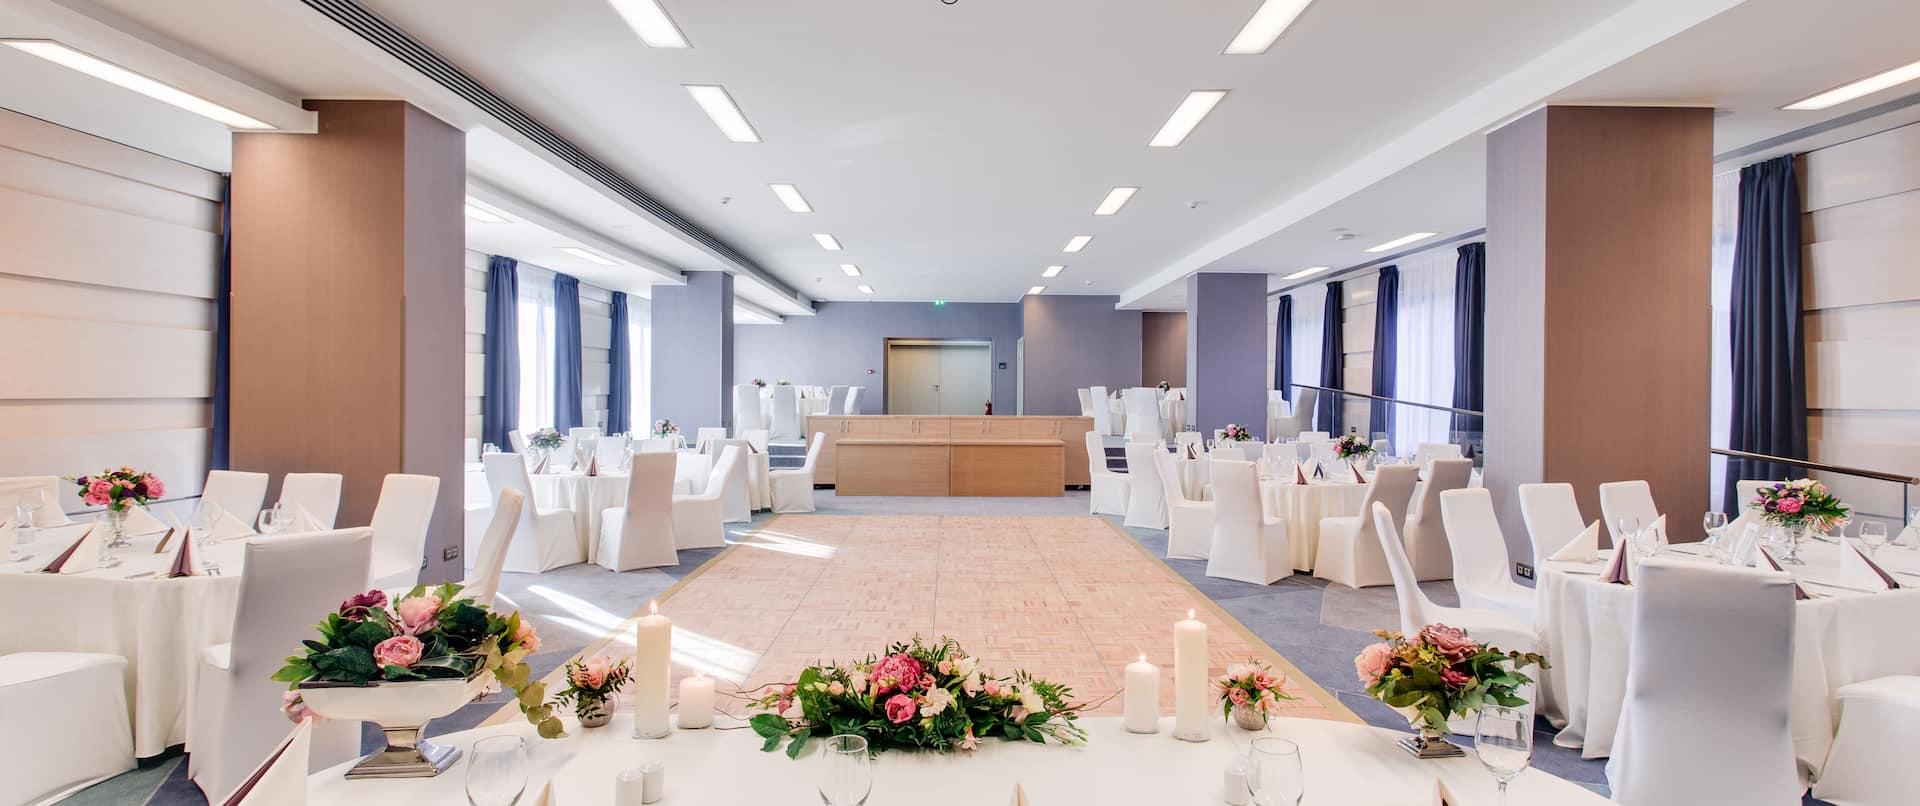 Ballroom Events Room